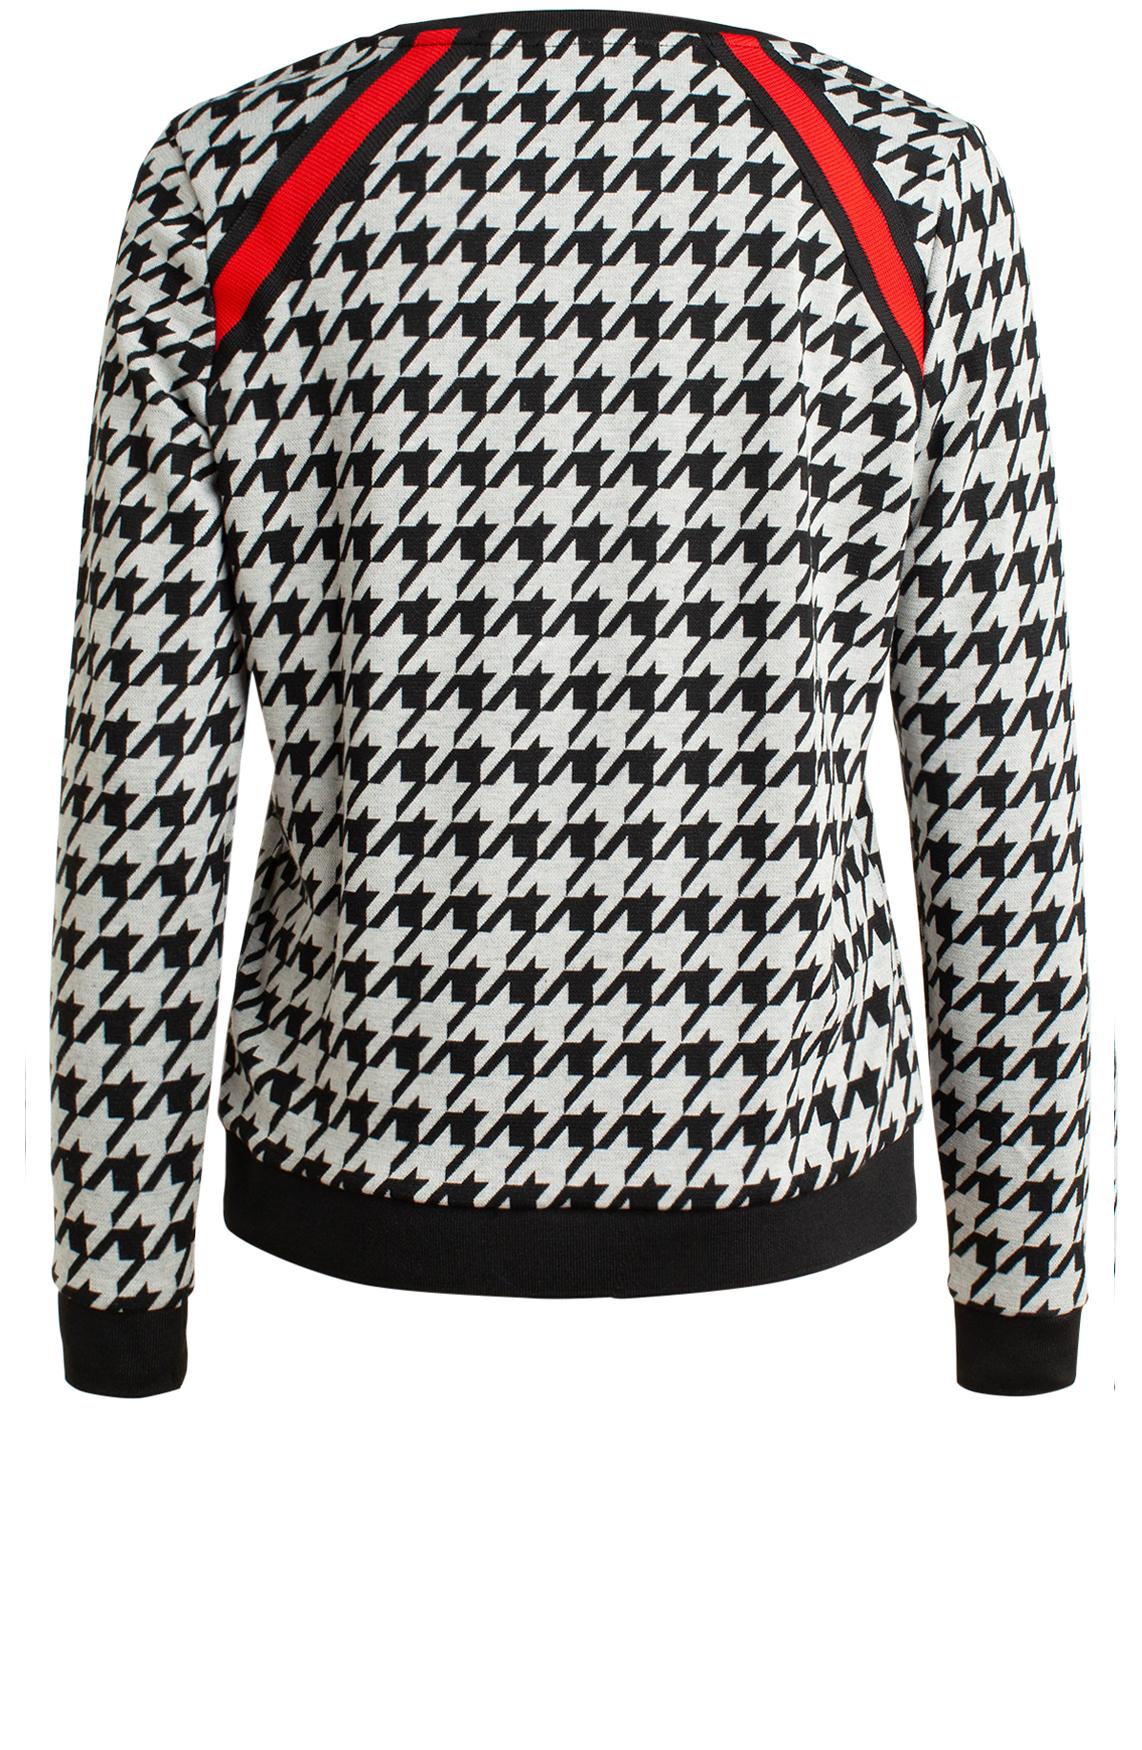 Anna Dames Pied-de-coque sweater zwart